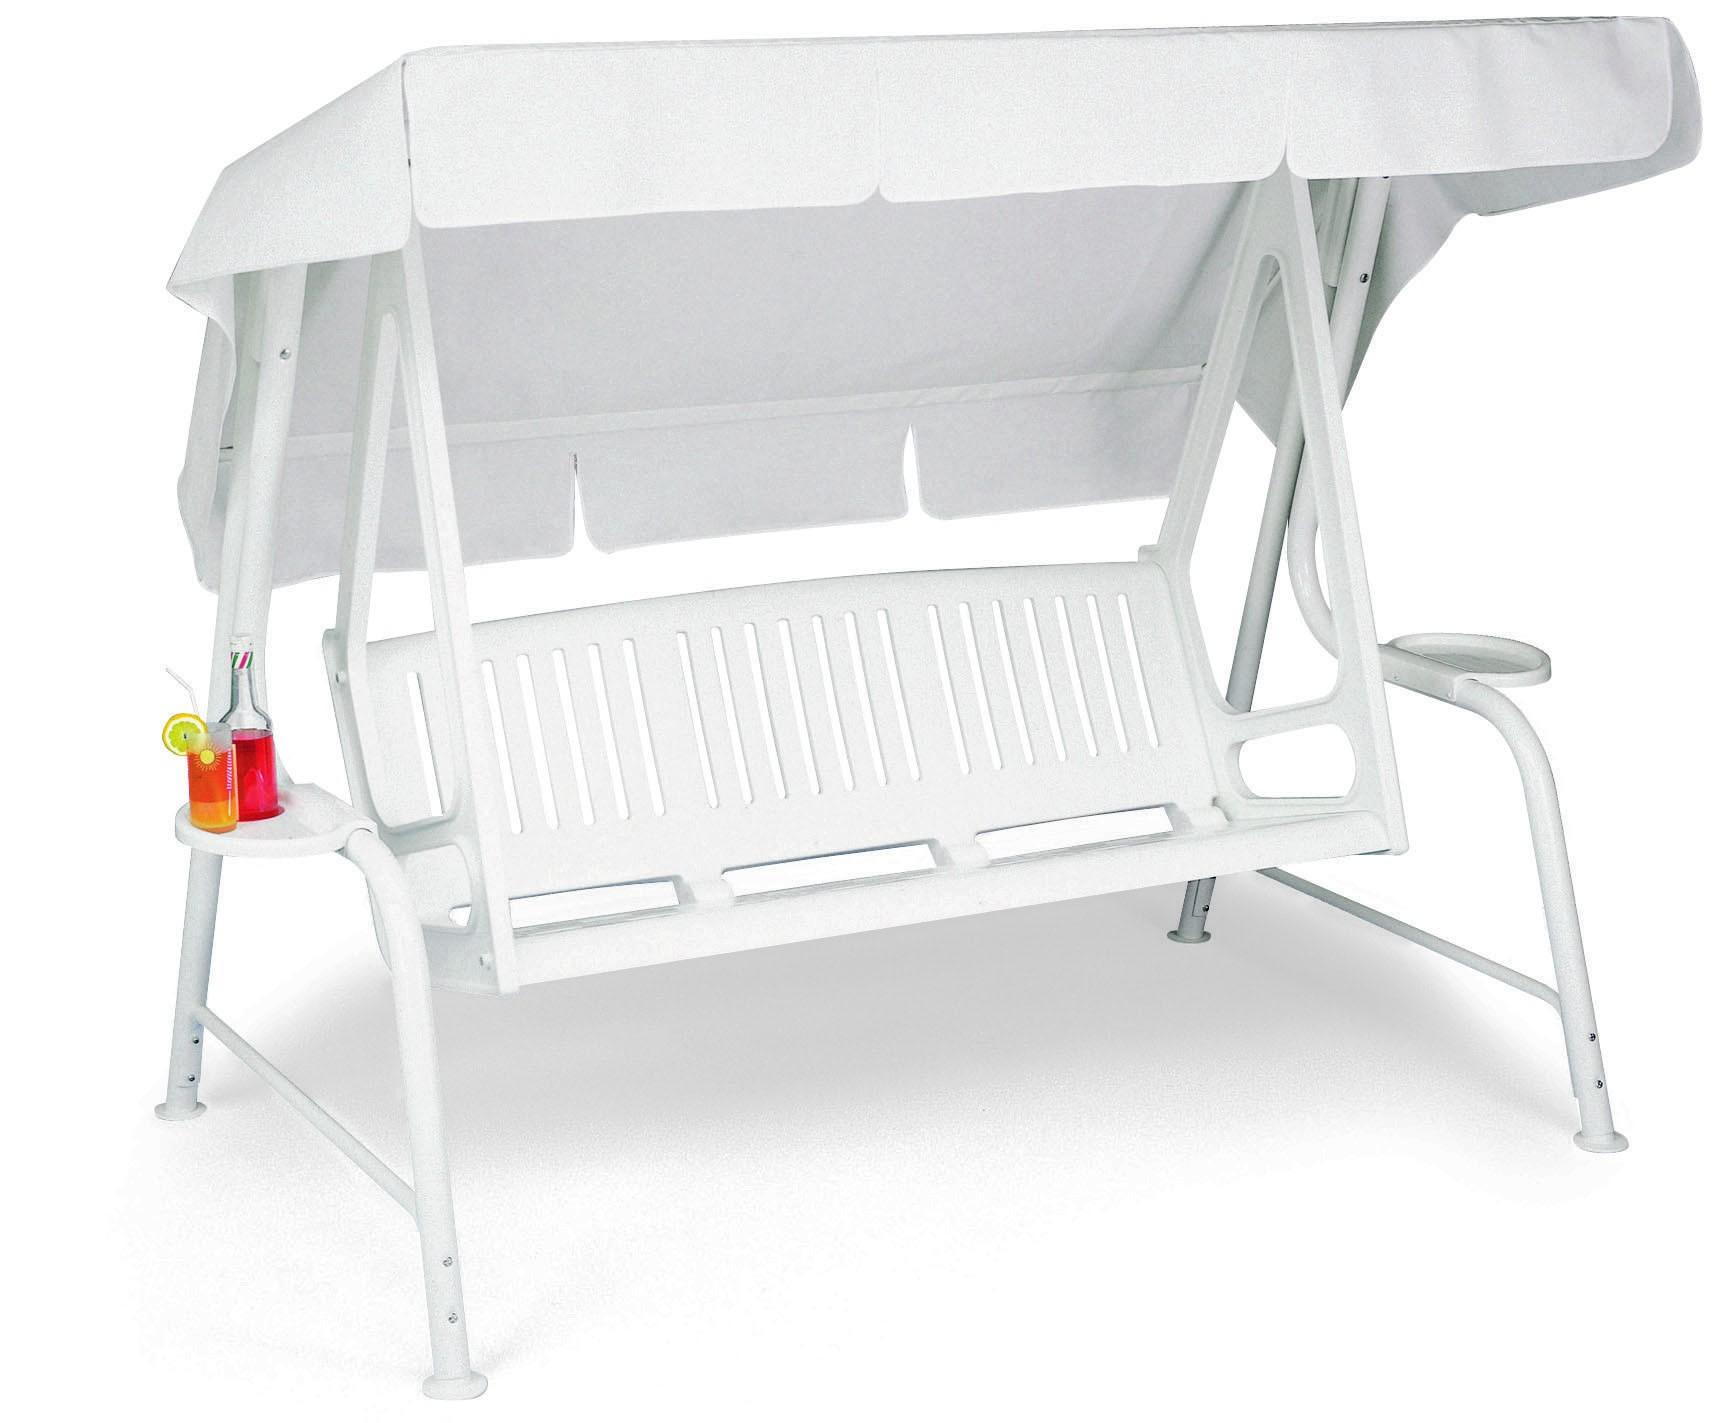 Dondolo lord 3p misto resina lamacchia mobili da giardino for Mobili da giardino in resina